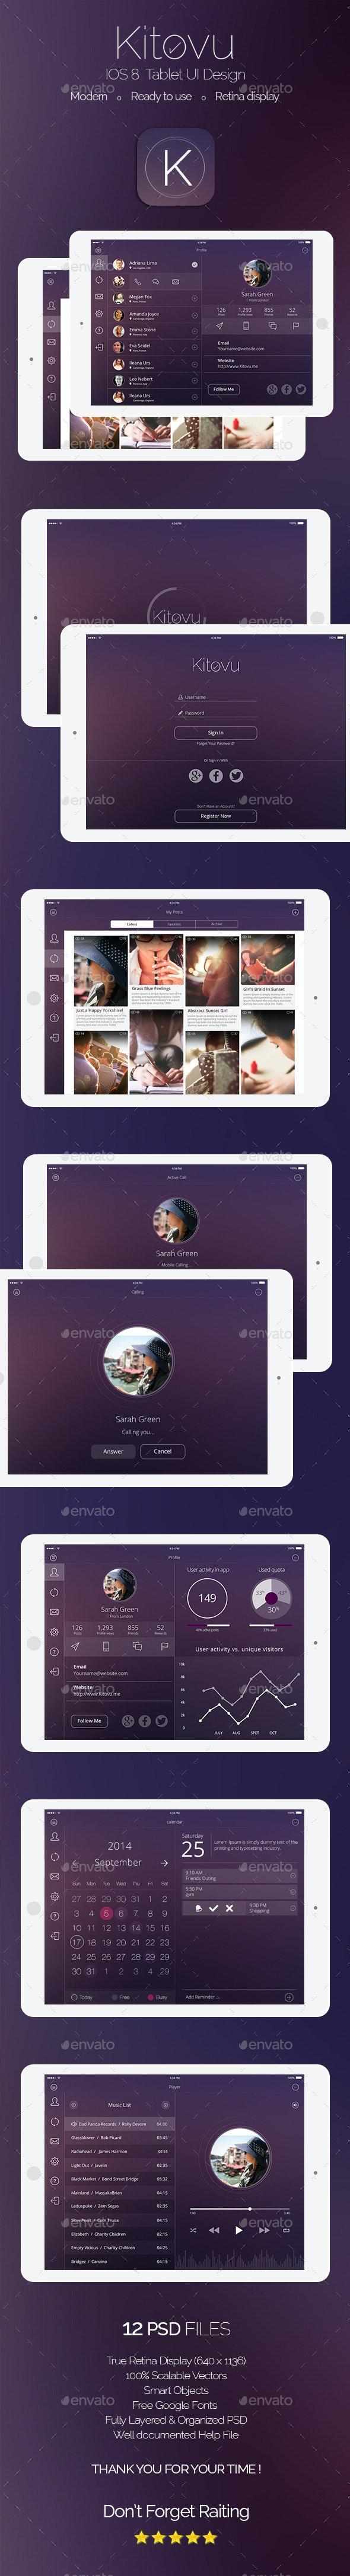 Kitovu IOS 8 Tablet Design  - User Interfaces Web Elements